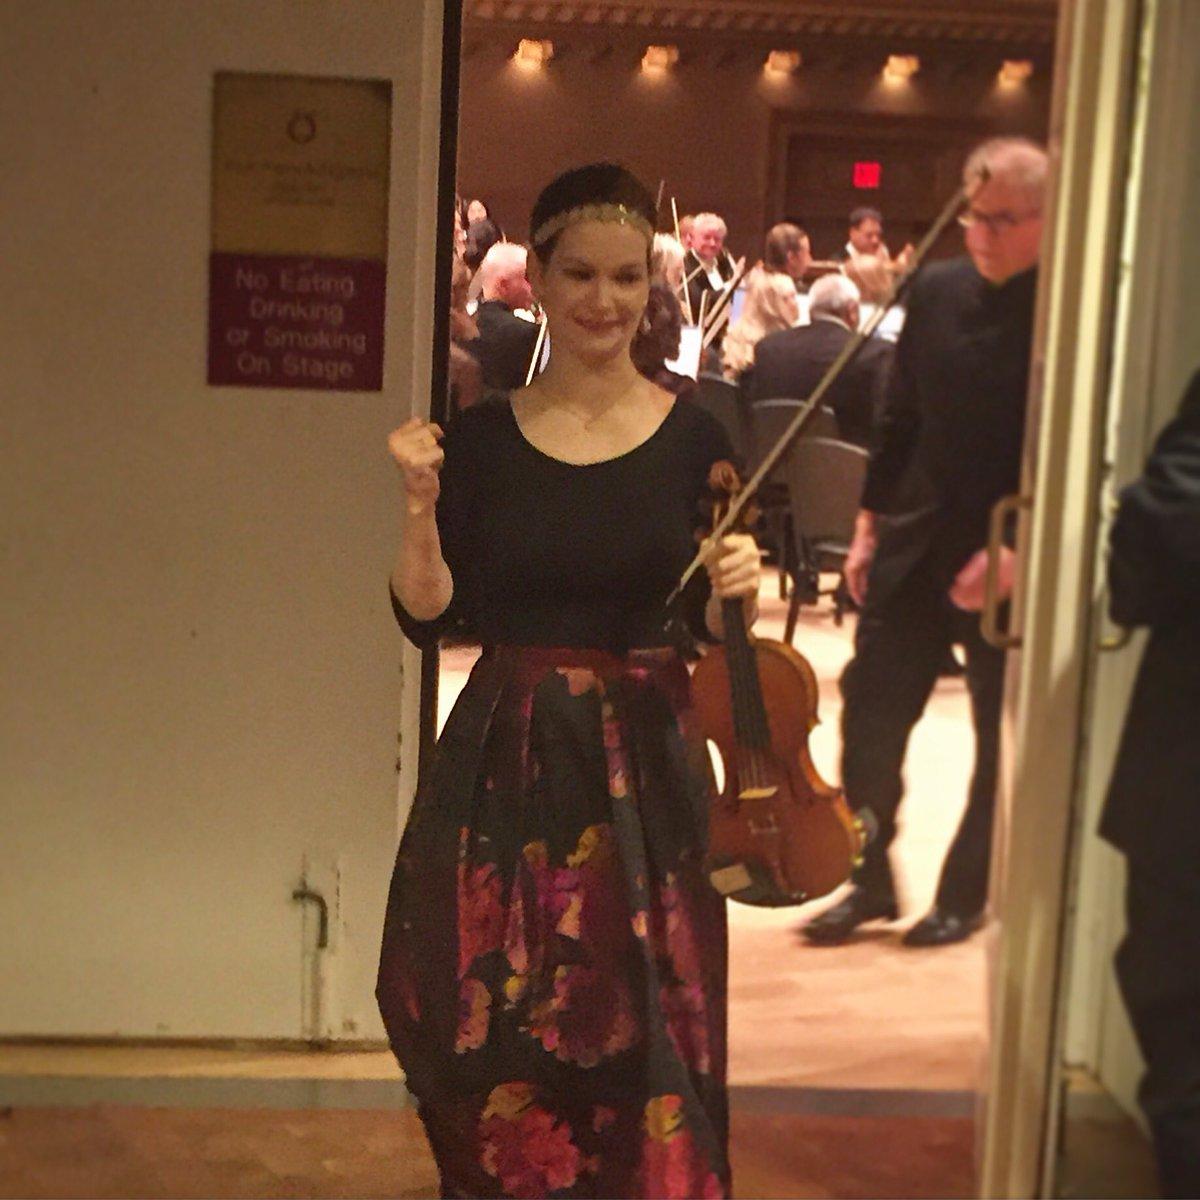 When you just nailed Sibelius's Violin Concerto at Carnegie Hall. #CHLive #nailedit https://t.co/TbziLK7HI3